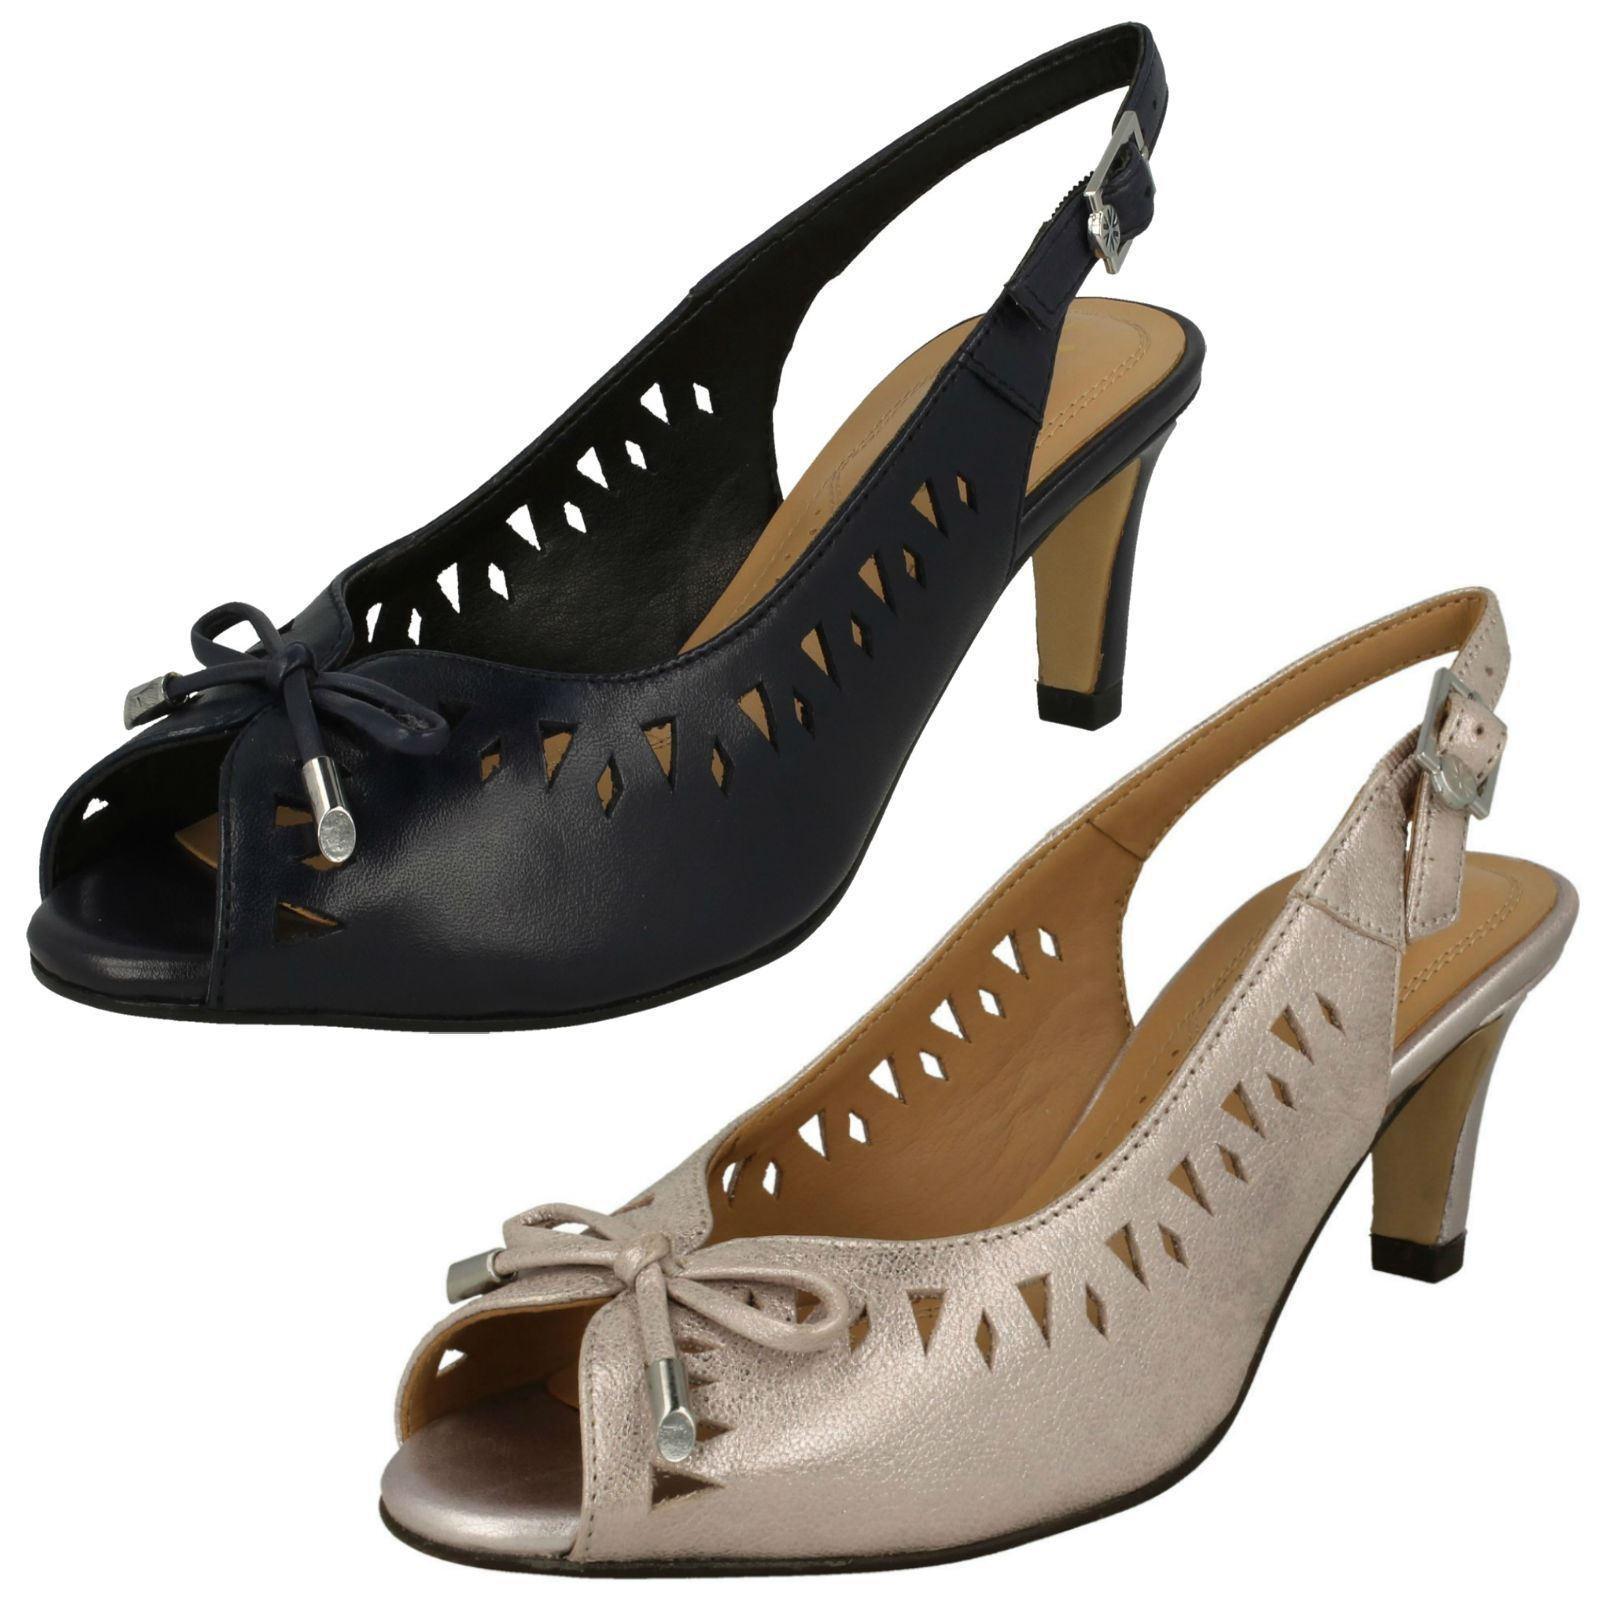 migliori prezzi e stili più freschi Ladies Van Dal Peep Toe Sling Indietro Sandali Sandali Sandali hazelbrook  spedizione veloce a te